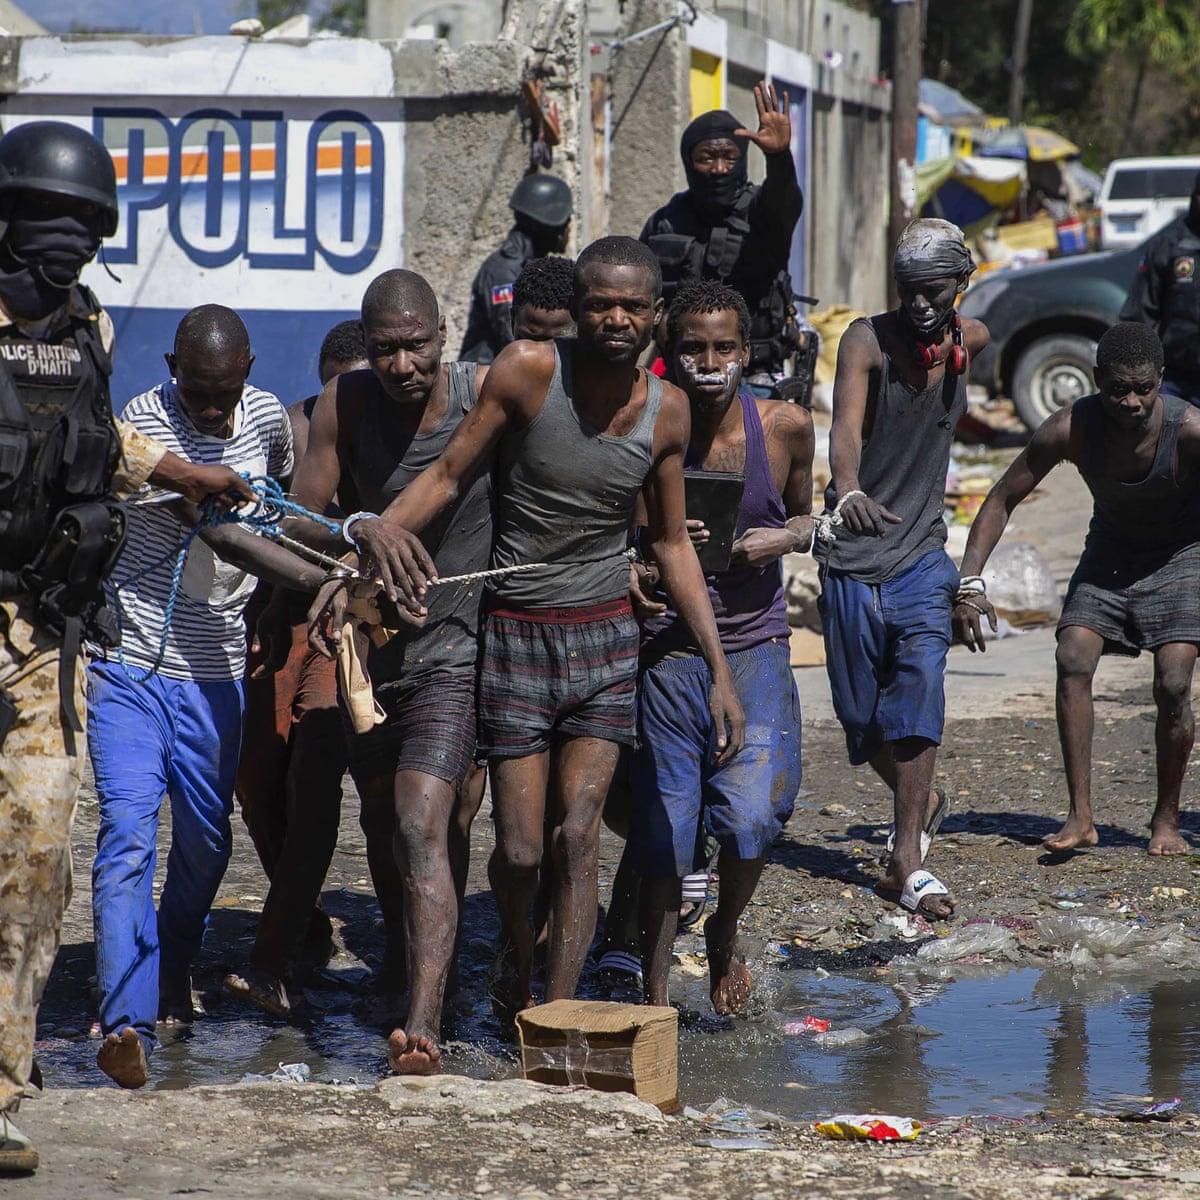 Prison director and gang leader among 25 killed in Haitian jailbreak | Haiti  | The Guardian